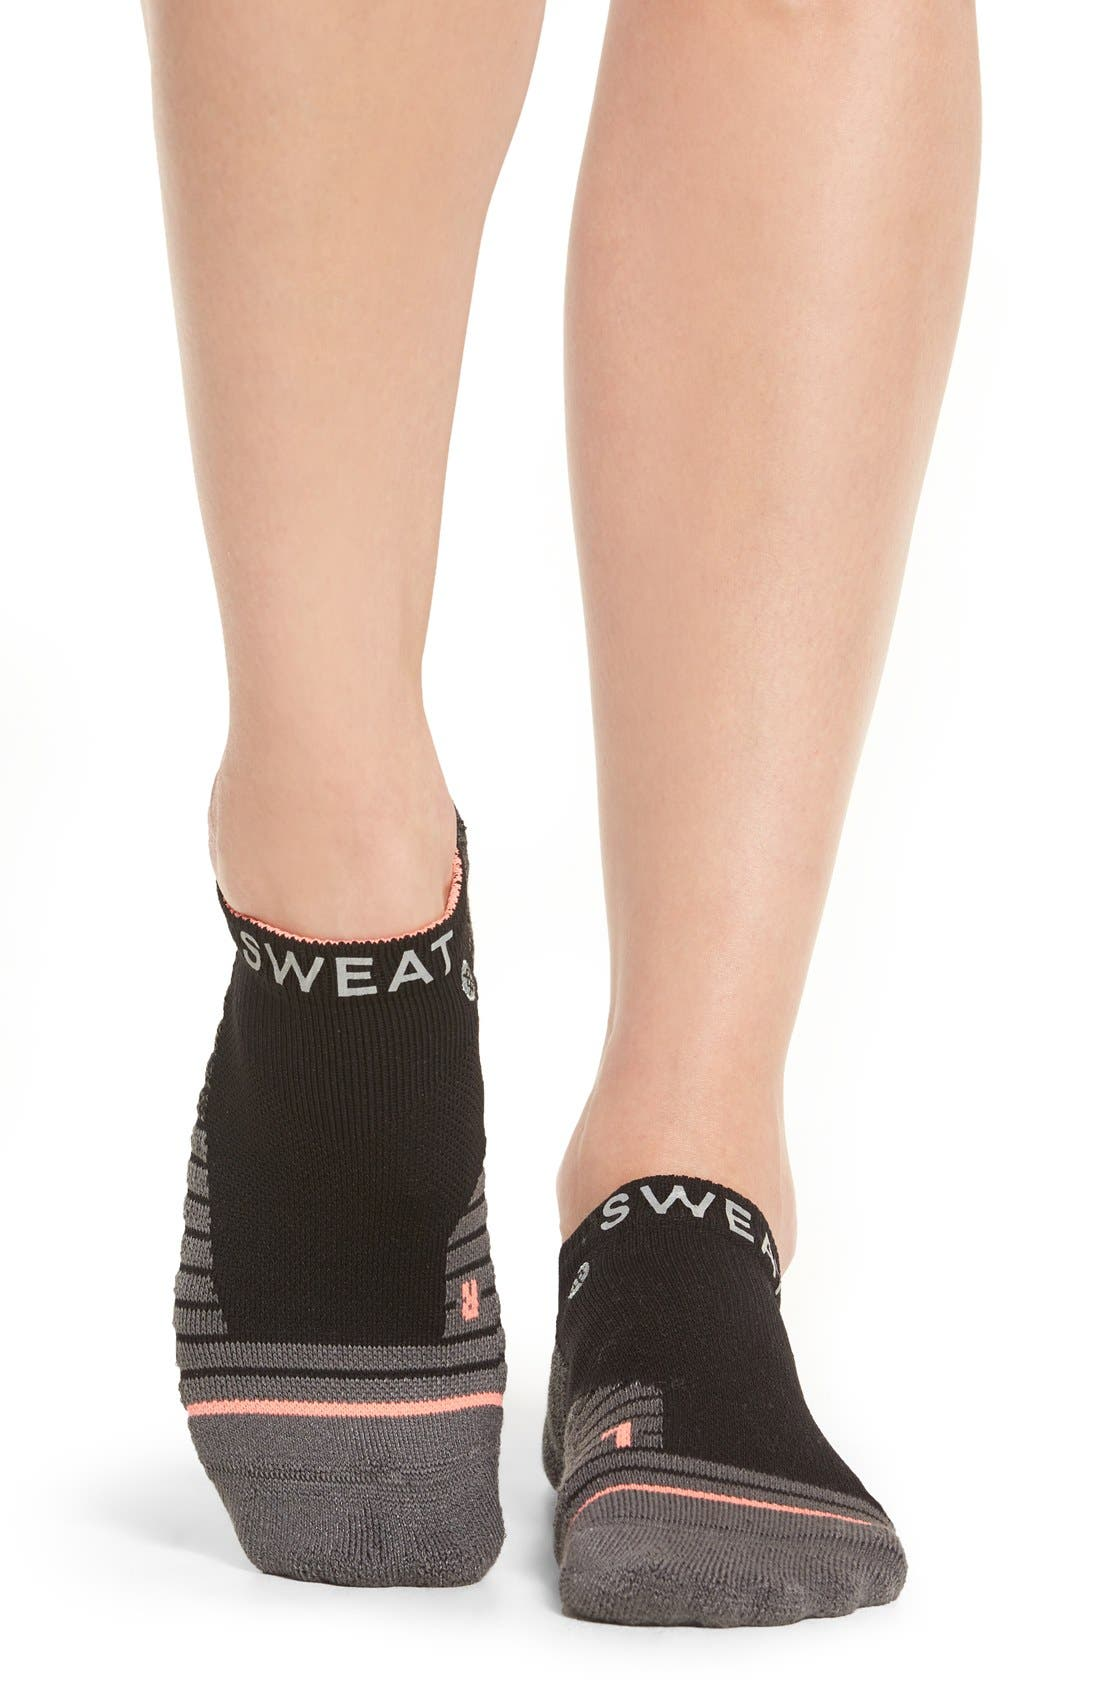 Reflective Sweat Socks,                             Alternate thumbnail 3, color,                             001